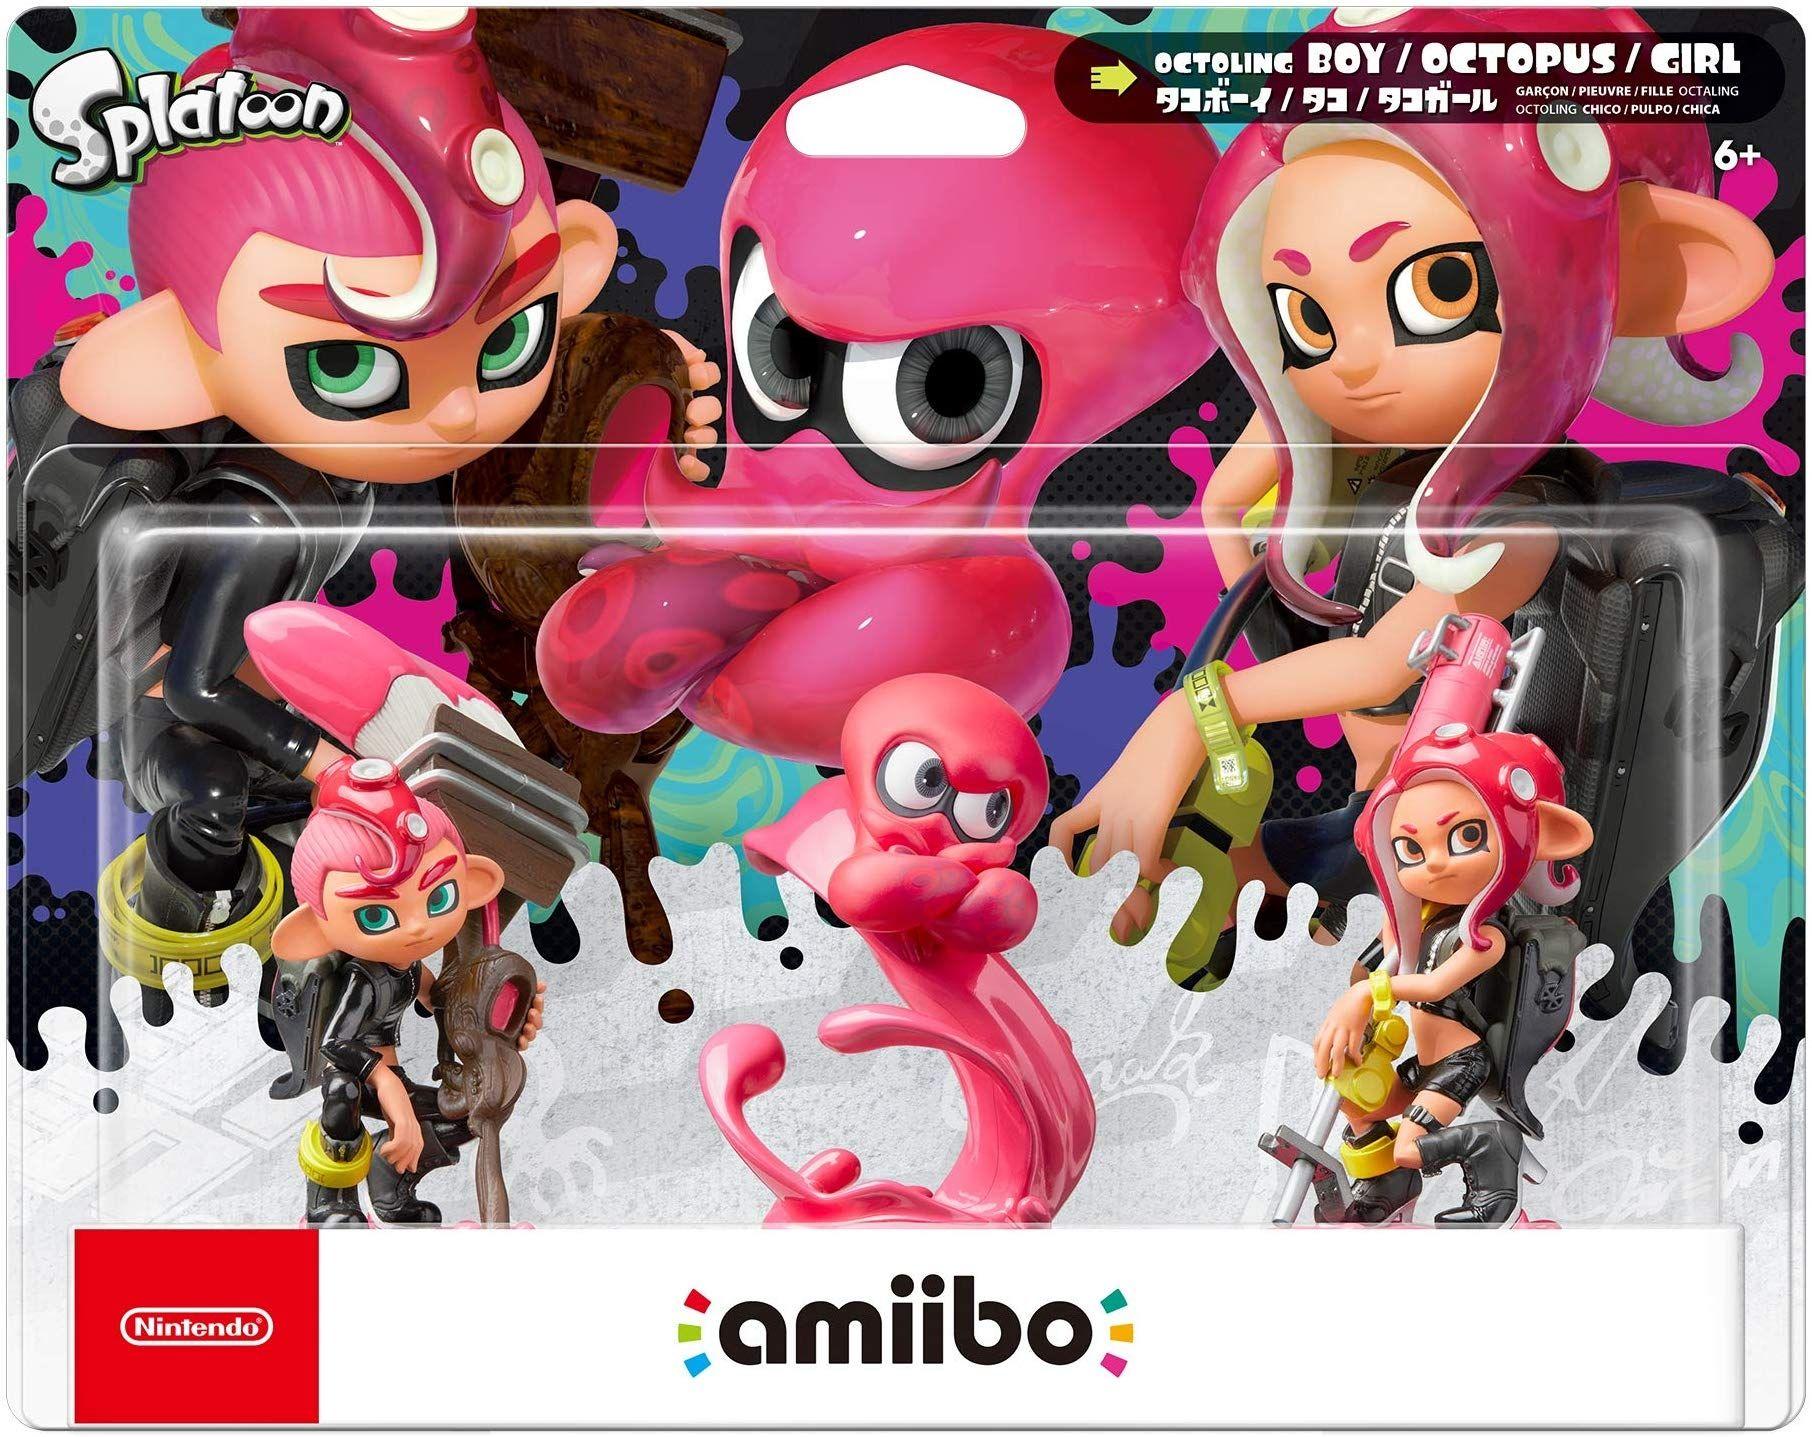 Nintendo Amiibo фигура - Octoling 3-pack [Splatoon] - 1